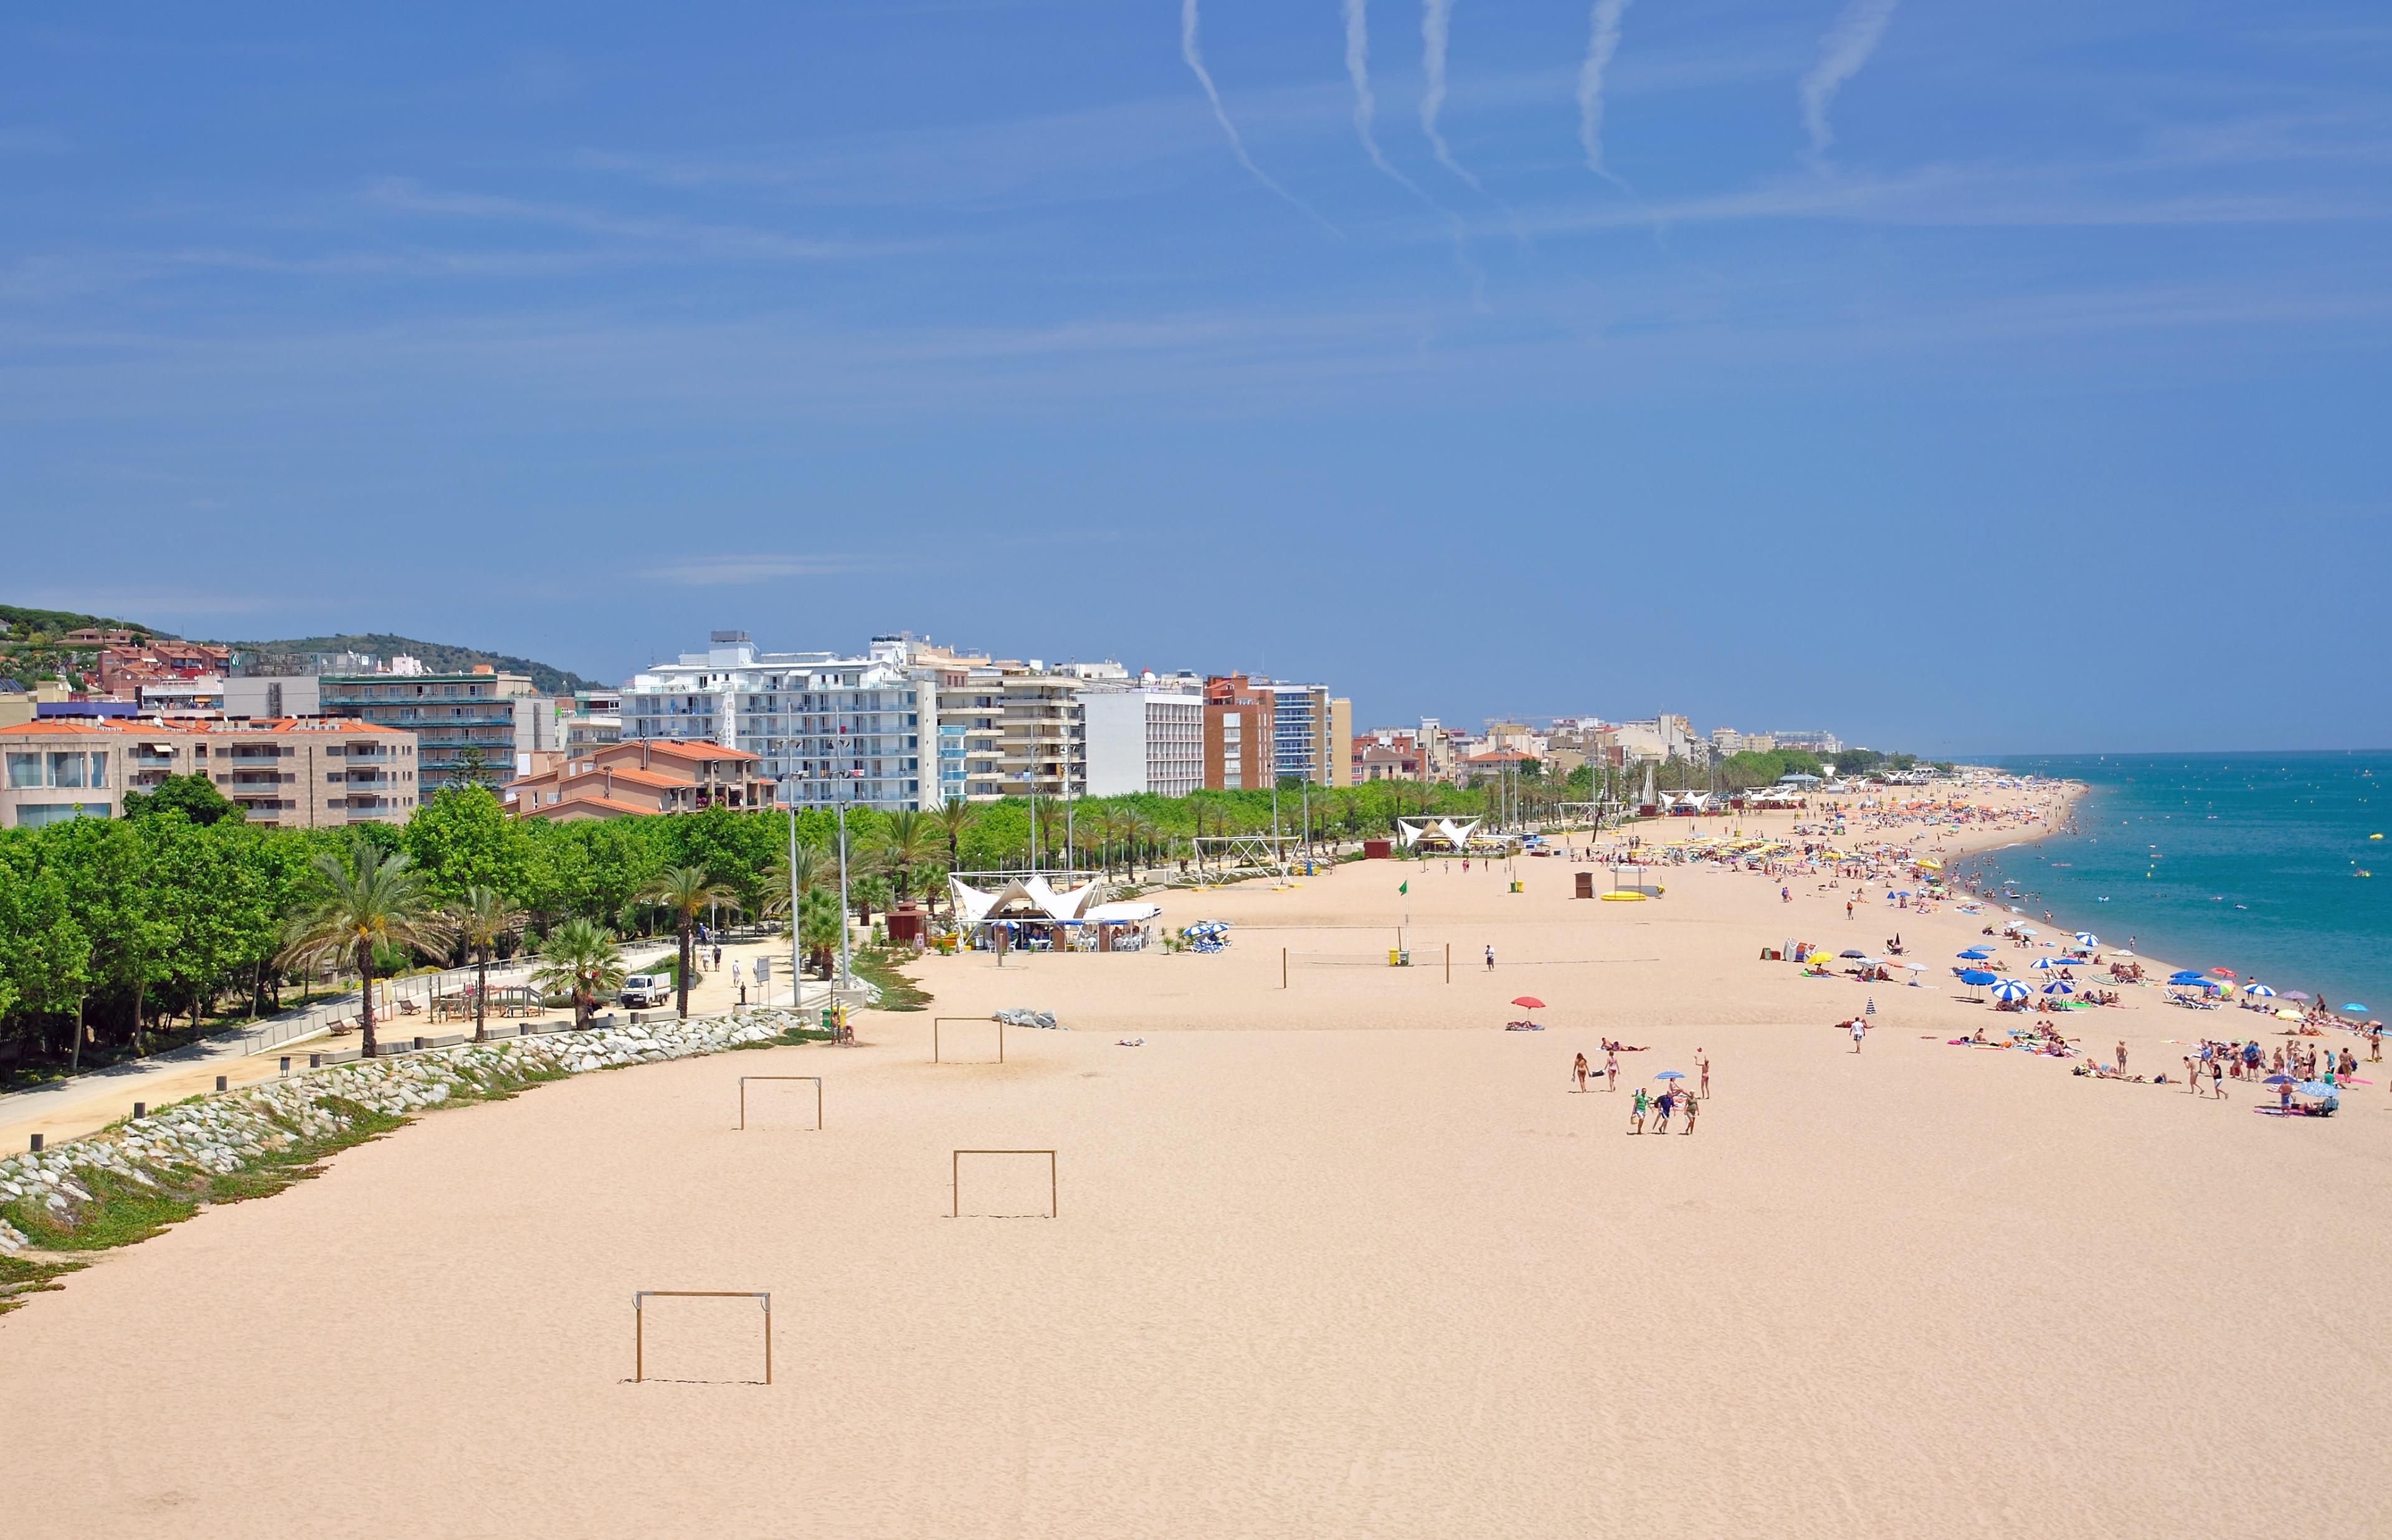 Calella, Catalonia, Spain